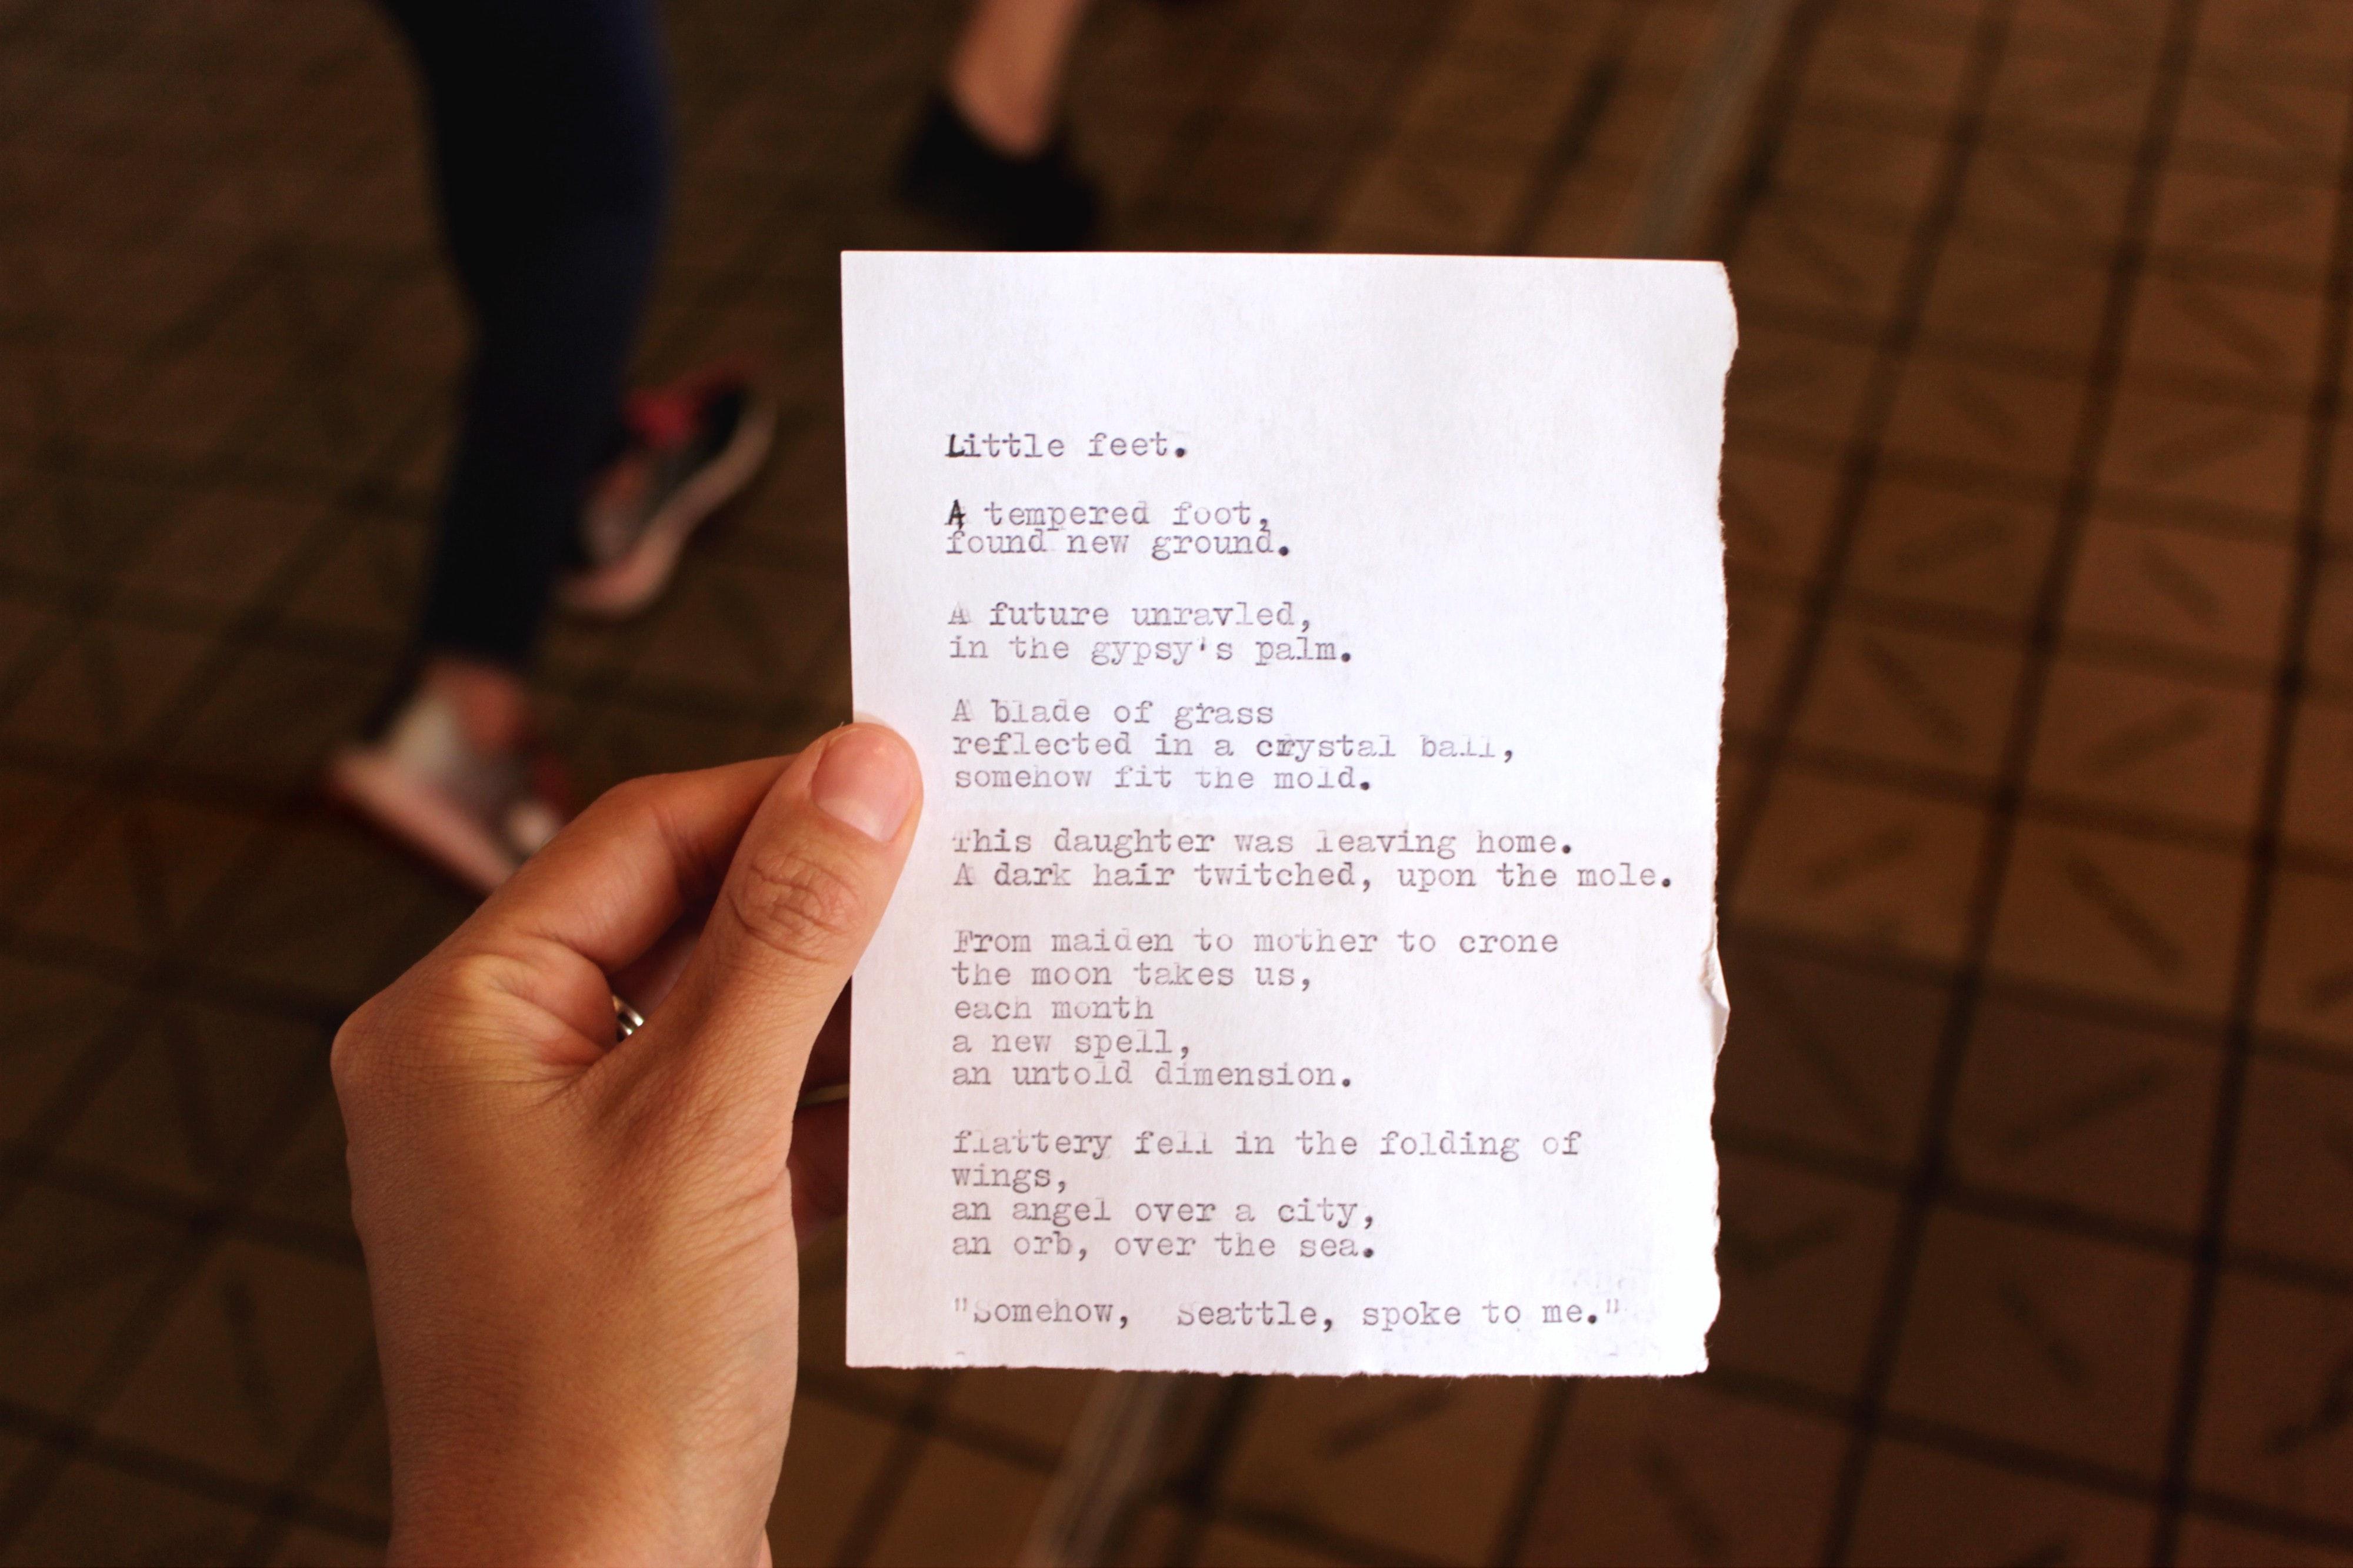 https://www.shrirammaheshwari.in/2020/05/this-is-not-poem.html